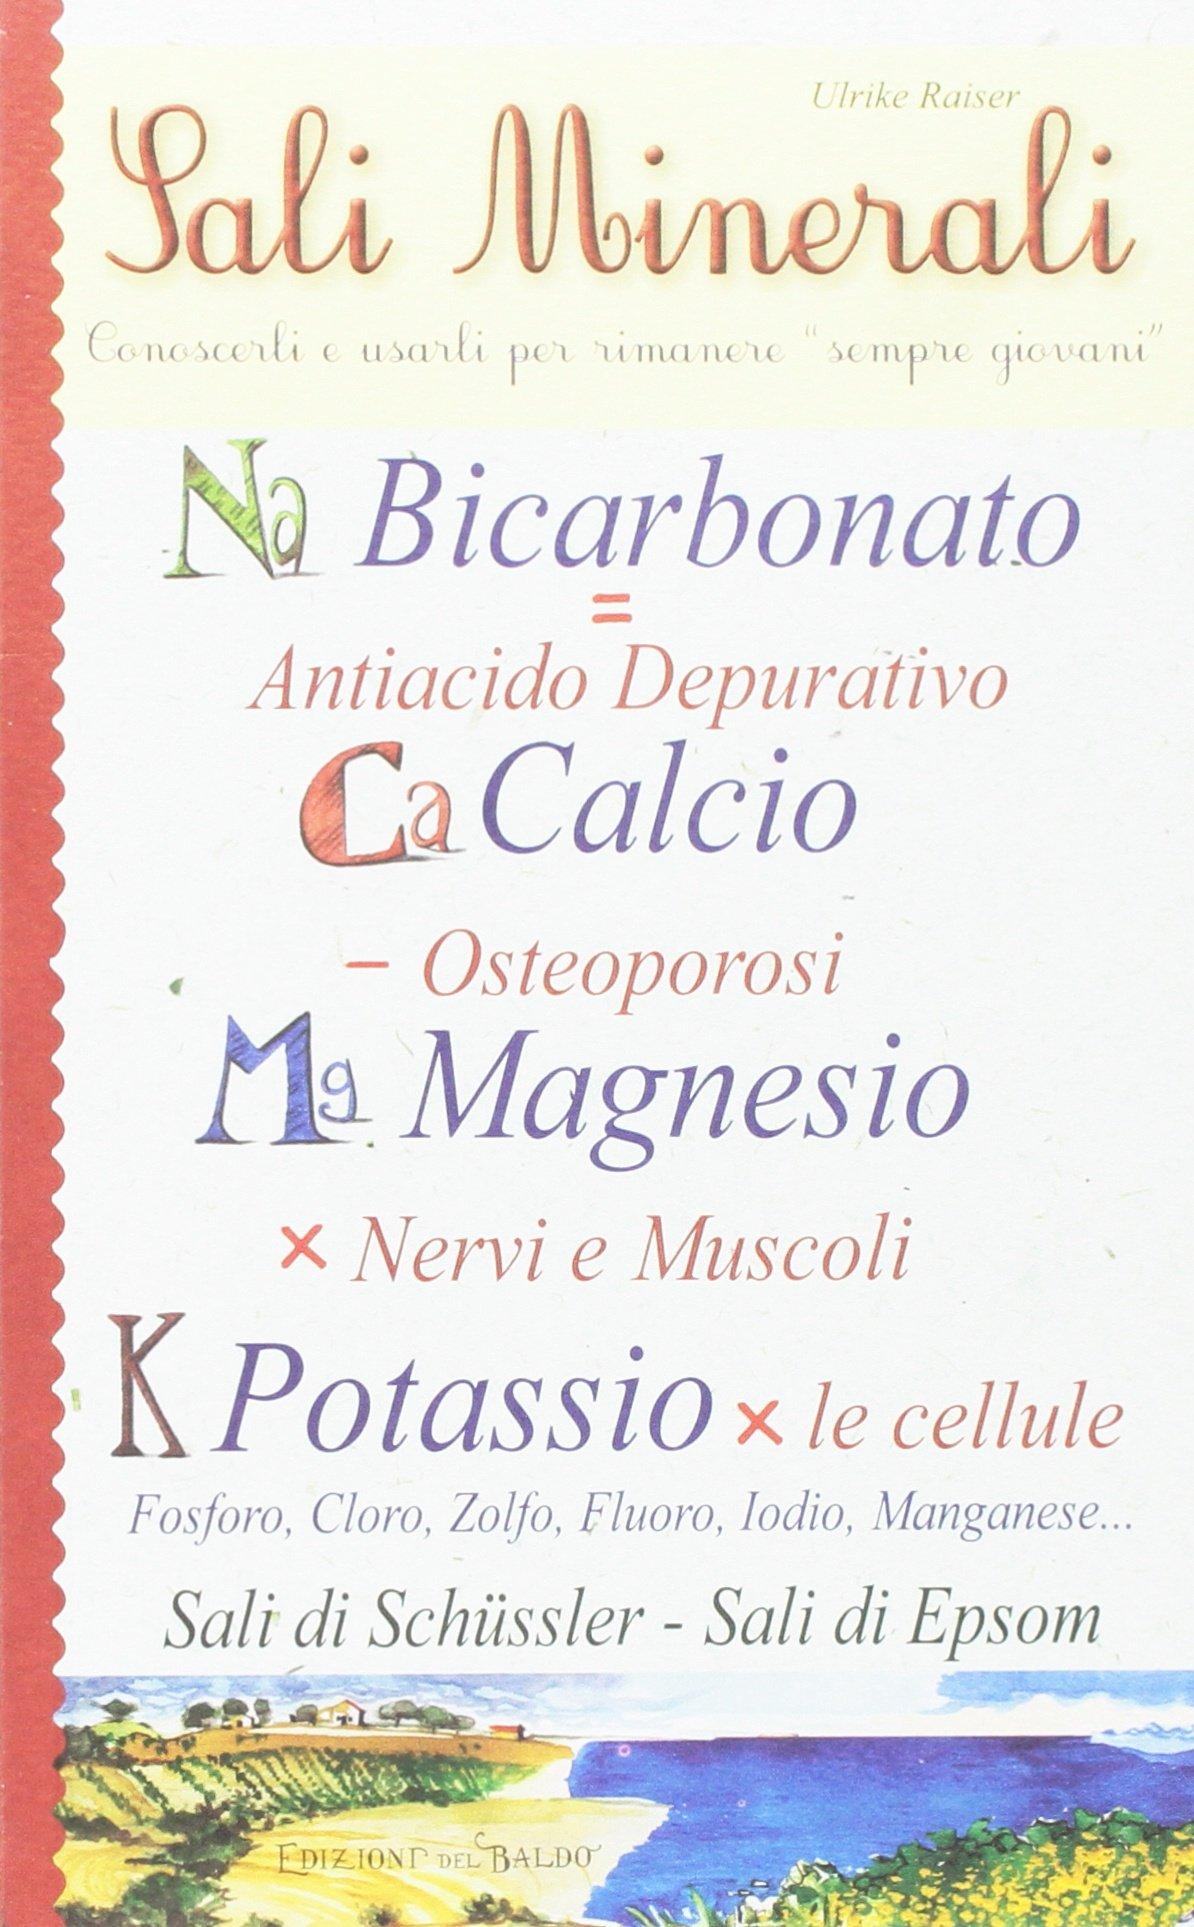 Sali minerali (Miracoli di natura): Amazon.es: Ulrike Raiser: Libros en idiomas extranjeros